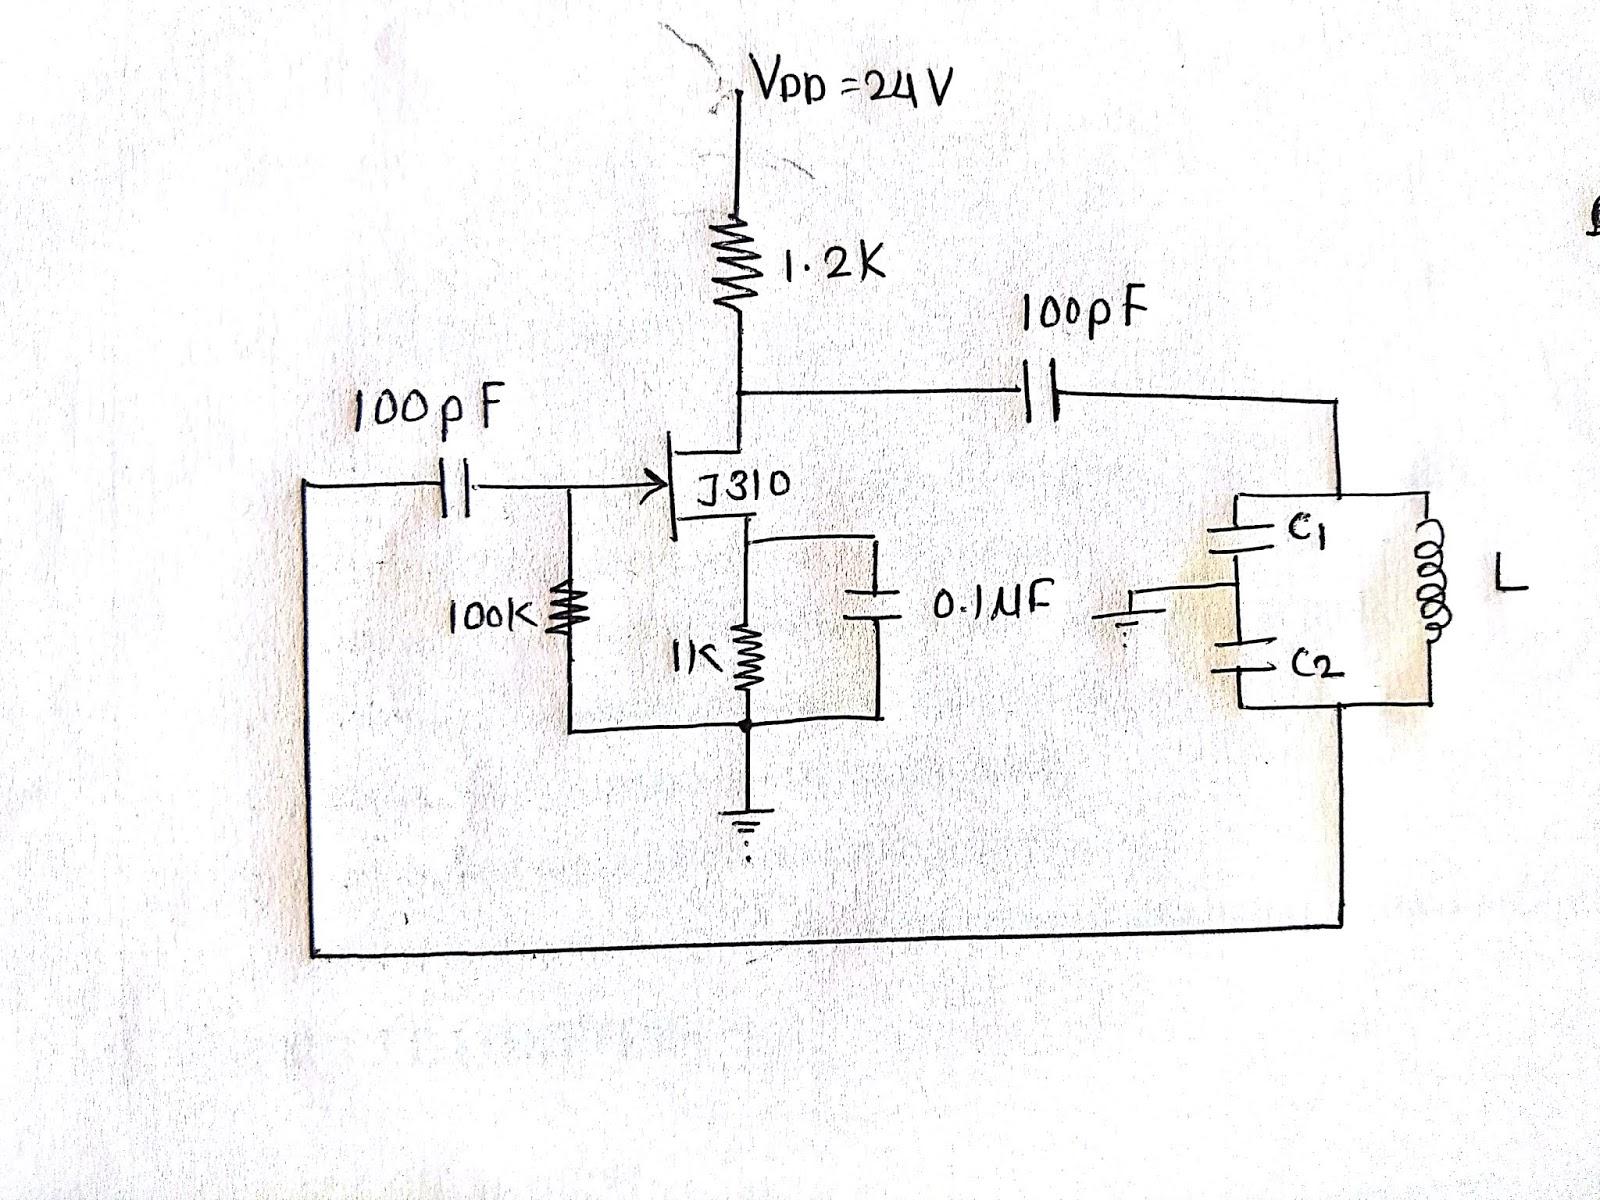 Techfosha Edc Simulation Lc Oscillator Using Fet Circuit Diagram